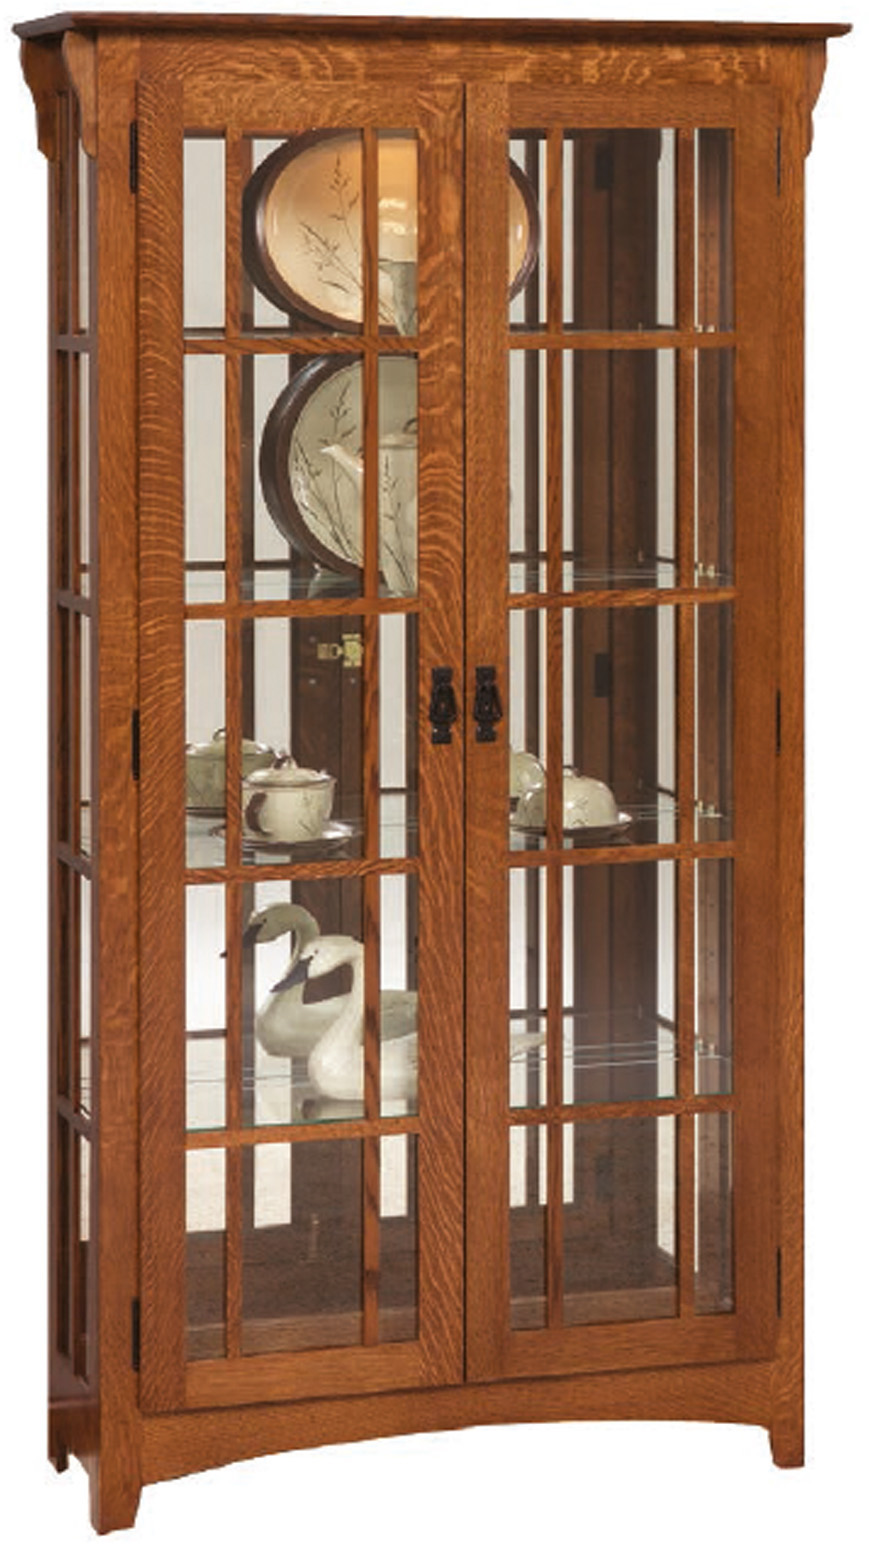 Mission Double Door Curio Cabinet Amish